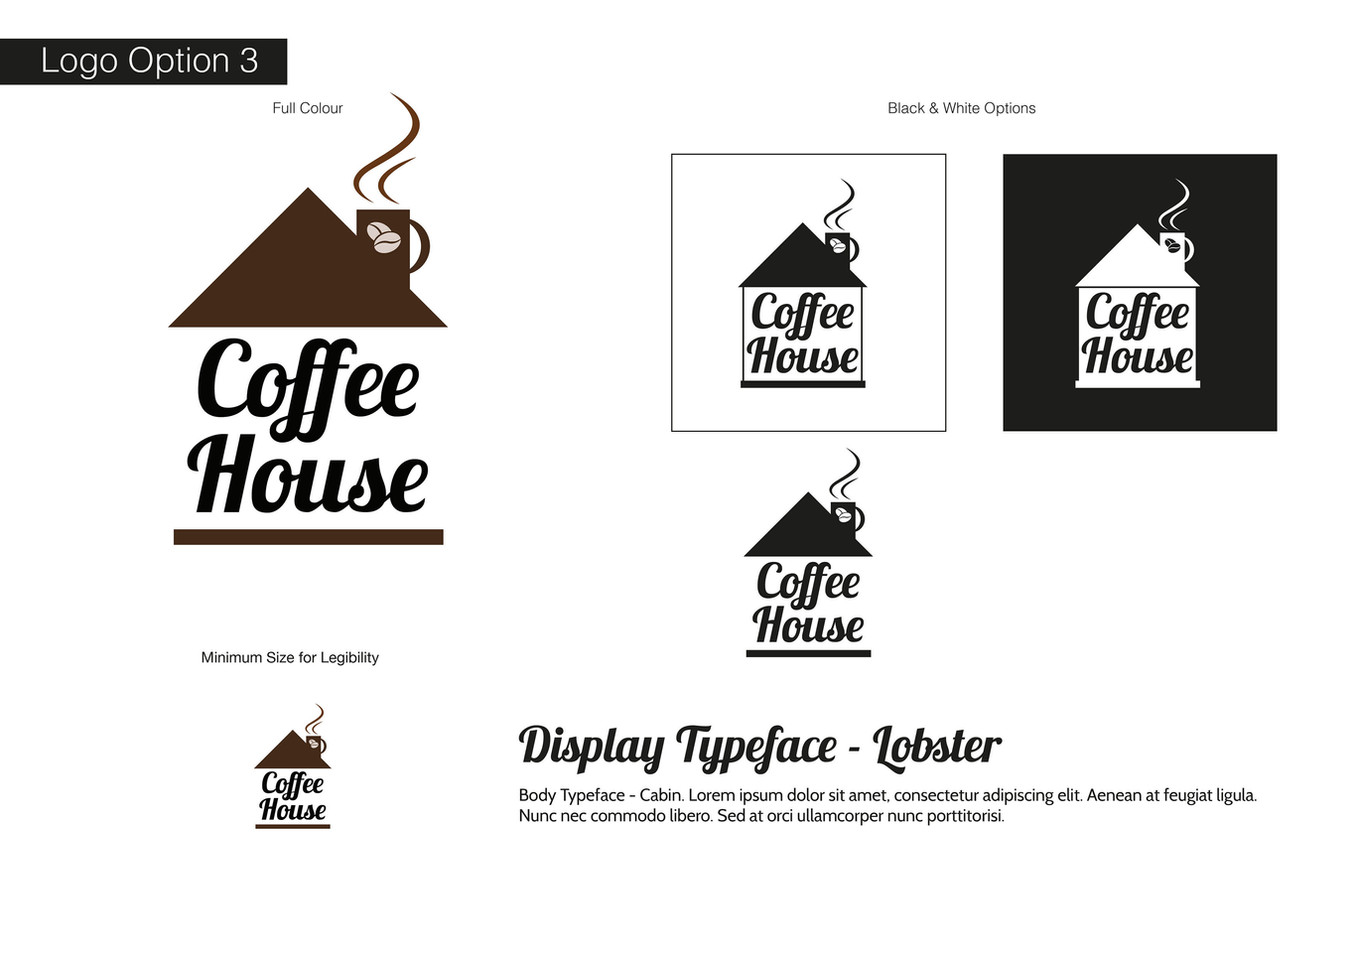 Coffee House Visual Identity - Development 3